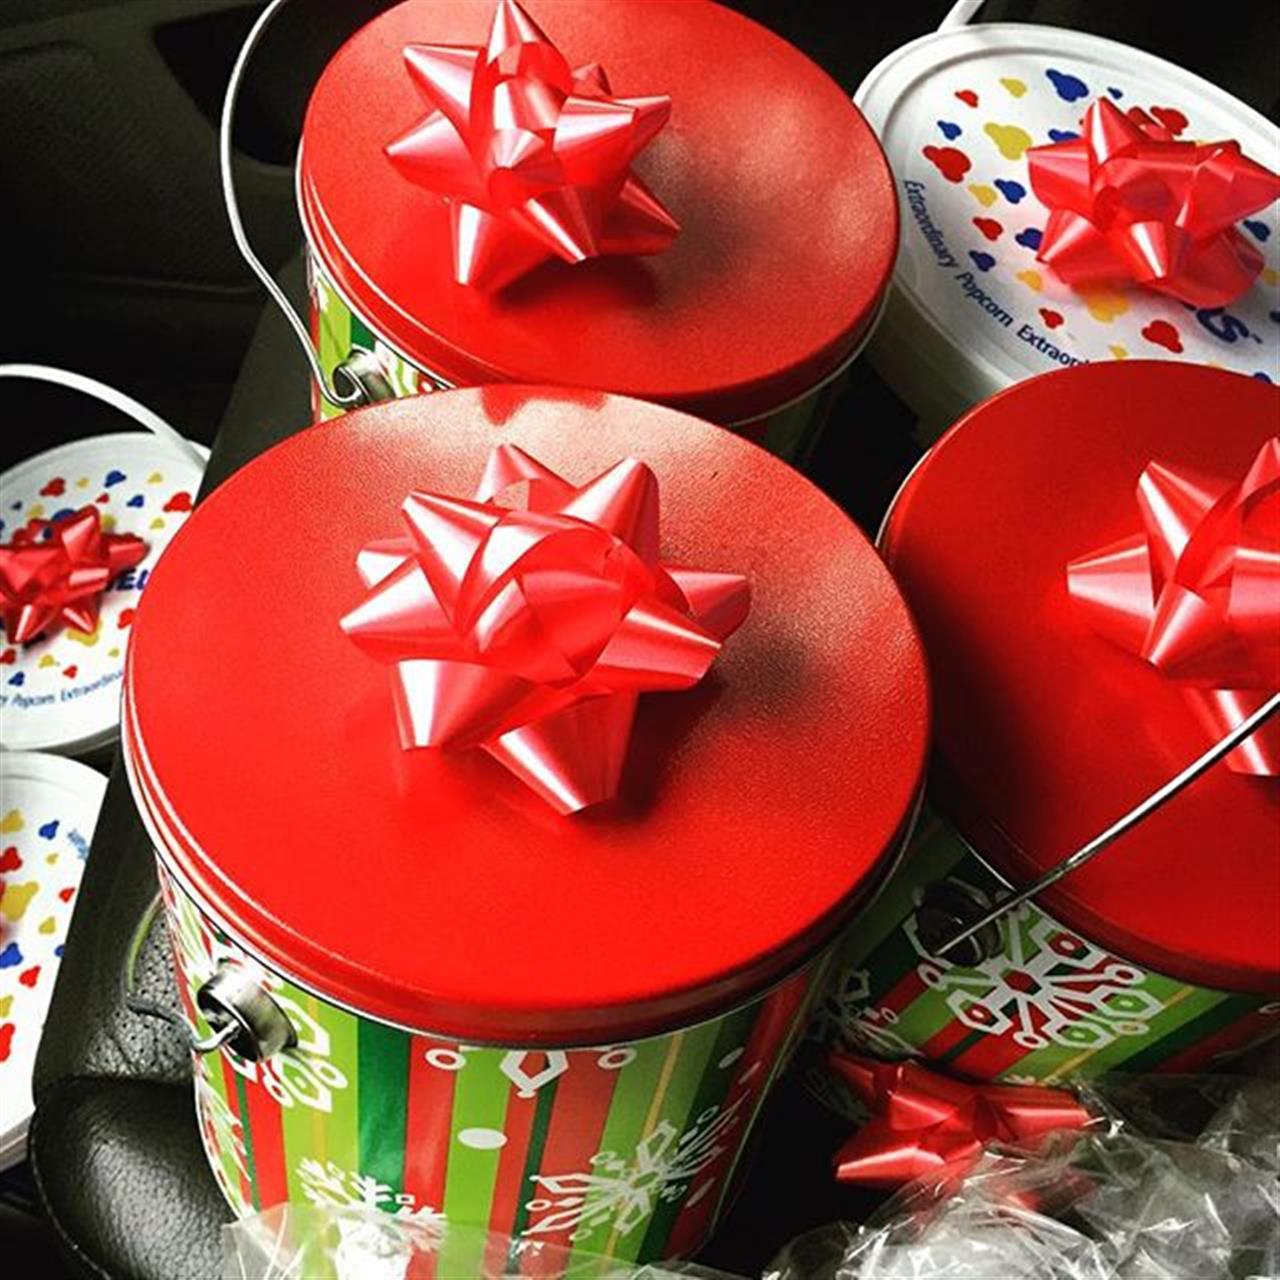 #christmas #deliveringtreats #day5 #realestate #leadingrelocal #oakbay #festive